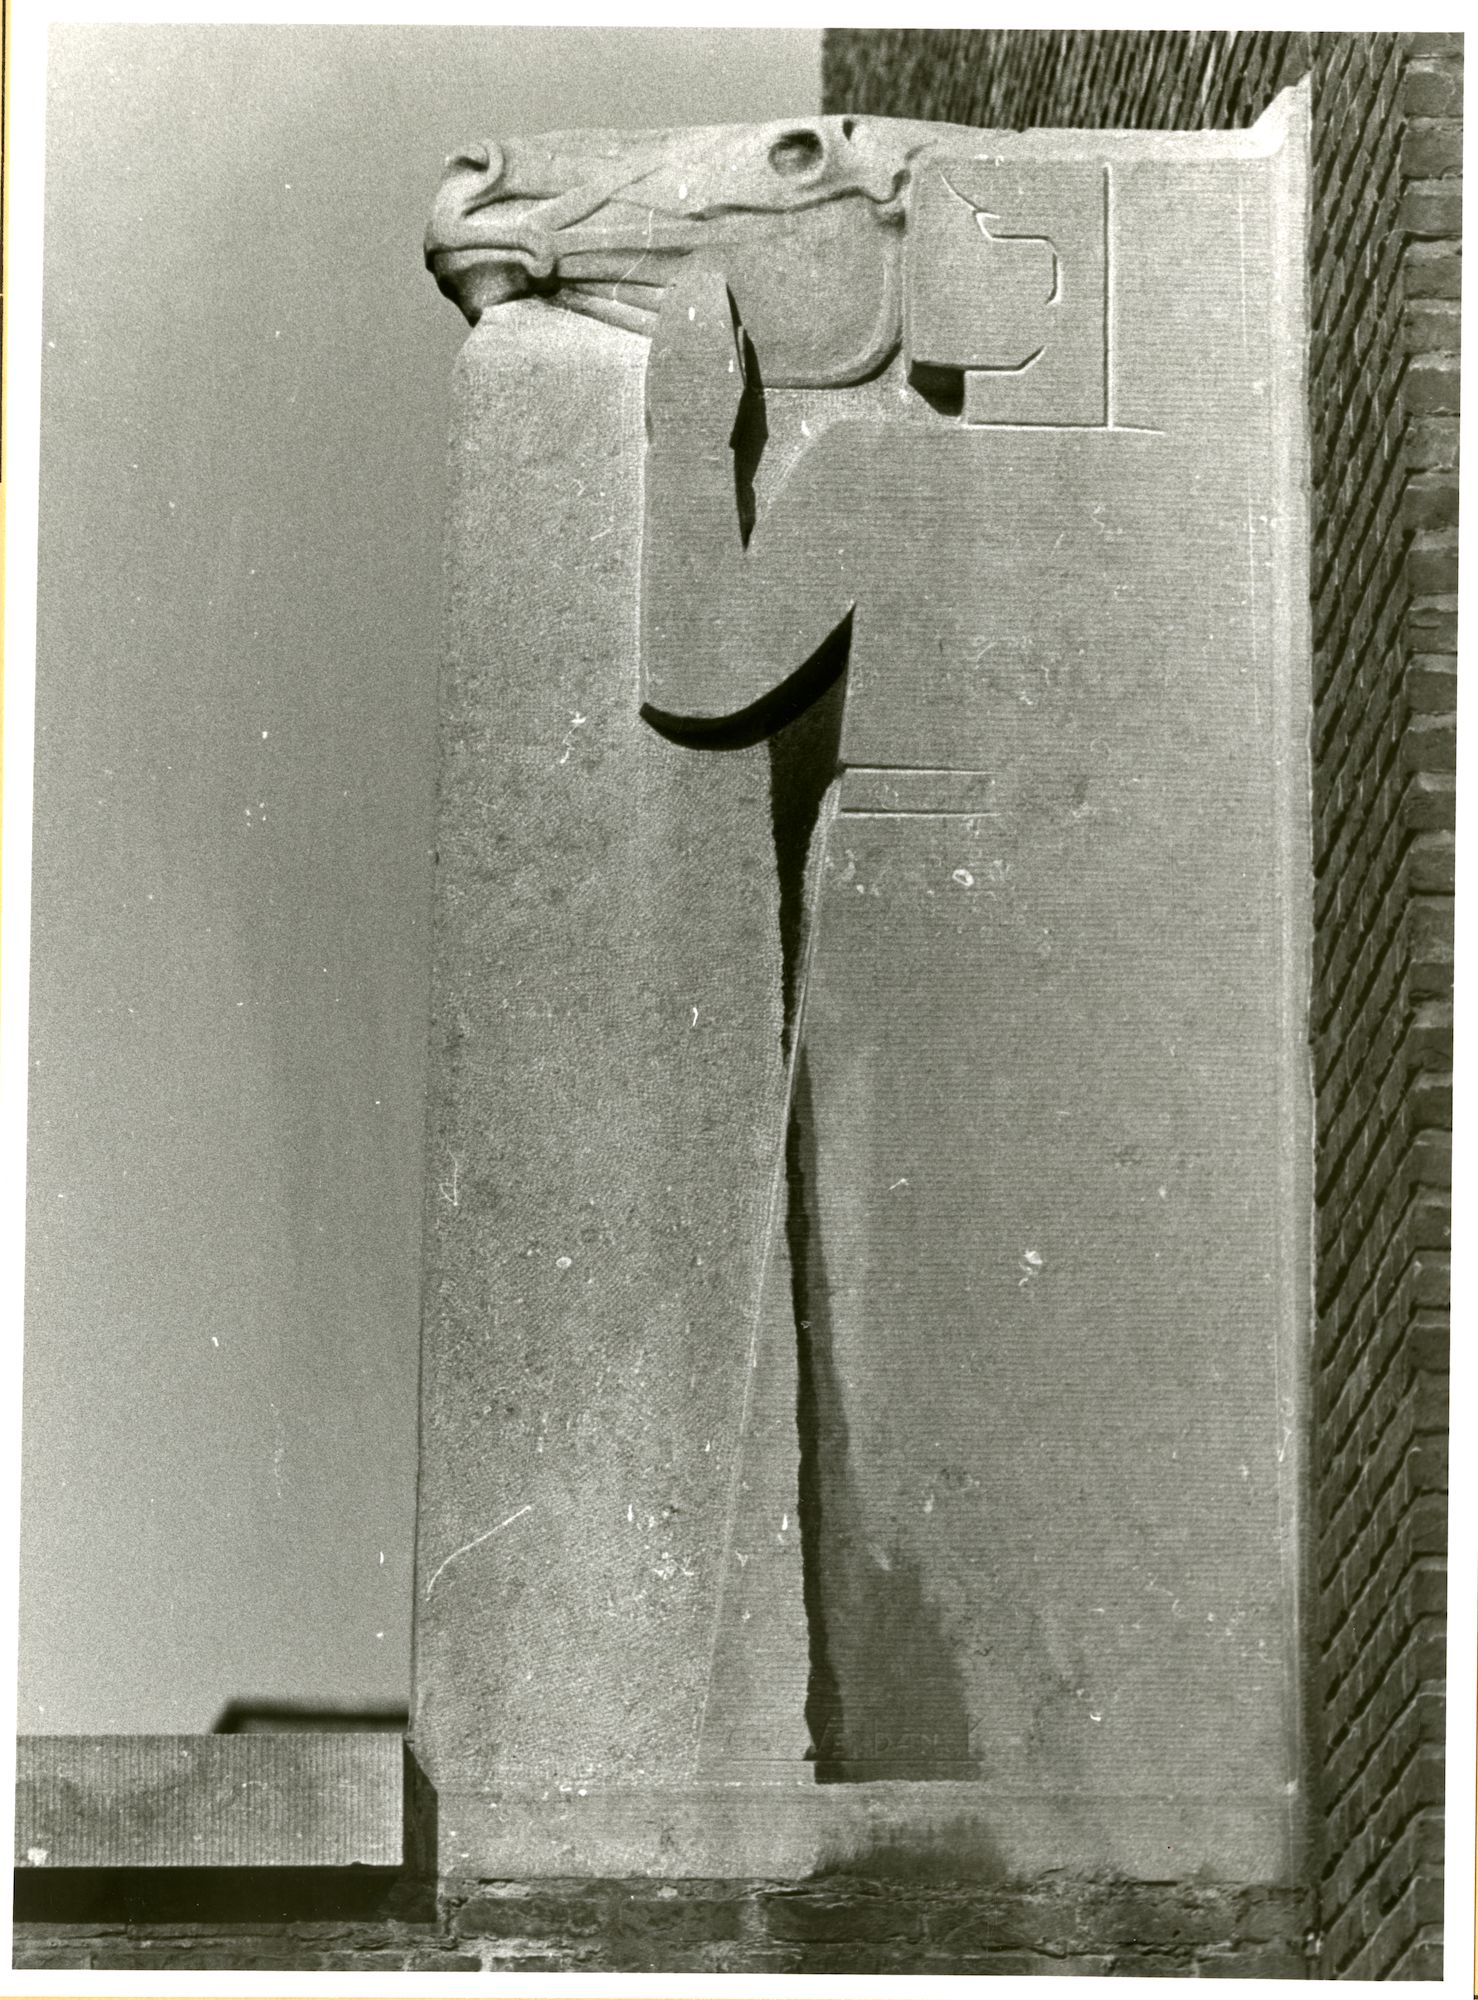 Gent: Casinoplein 26: Faculteit Dierengeneeskunde: beeldhouwwerk: man en paard, 1979